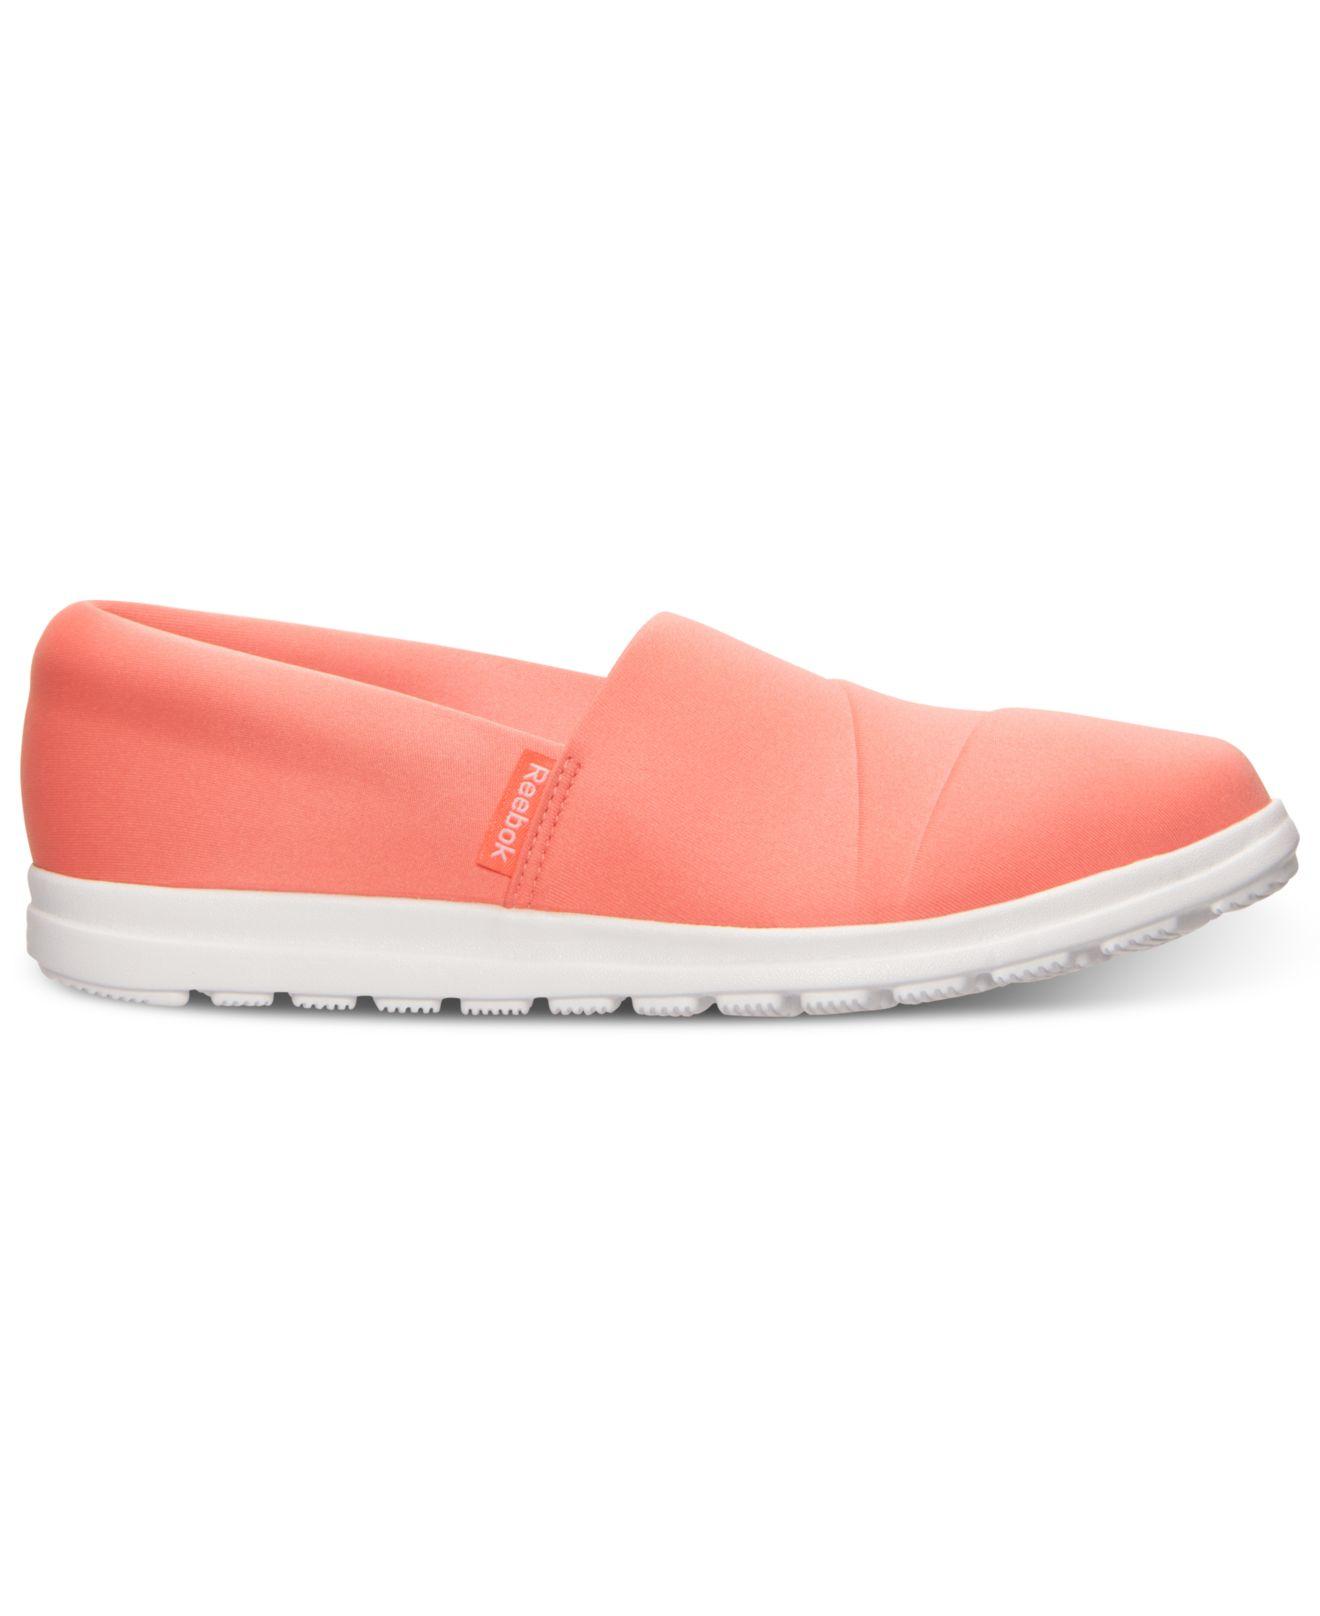 46ef5c42e17 Lyst - Reebok Women s Skyscape Harmony Walking Shoes From Finish ...